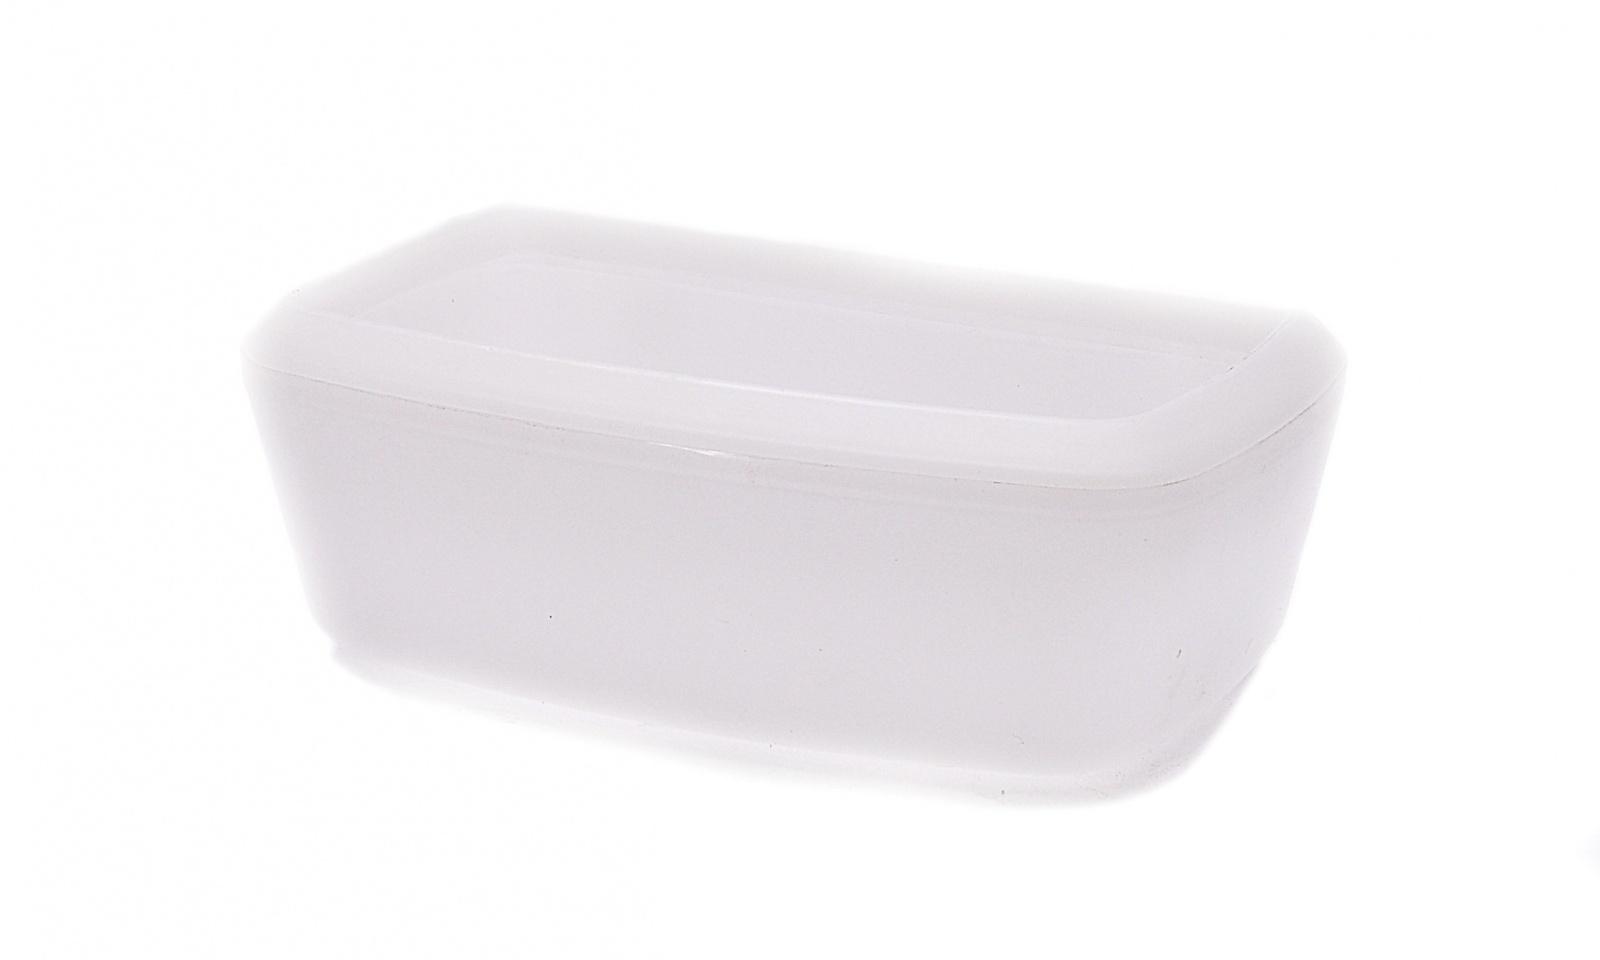 stefanplast Stefanplast Поилка для переносок 16x10x5,7 (Large water basin) 10691